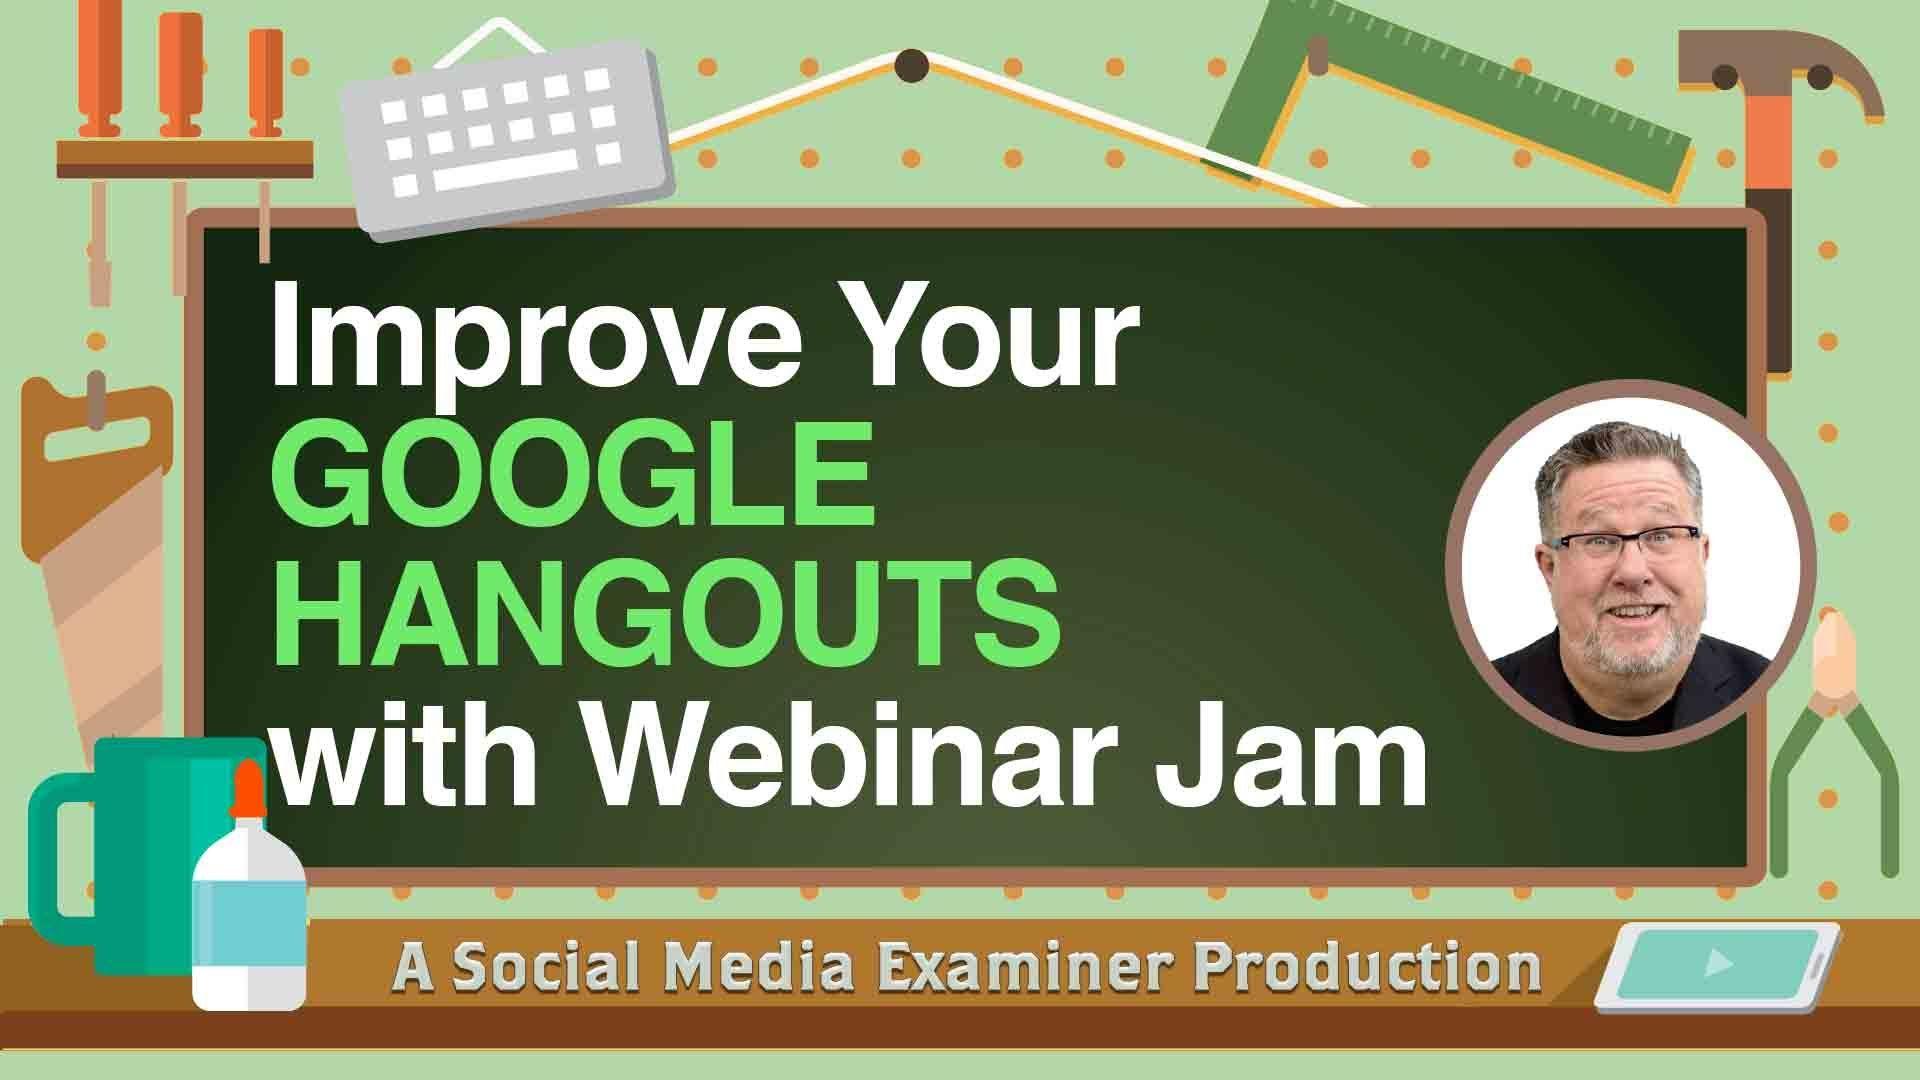 Improve Your Google Hangouts with WebinarJam Social